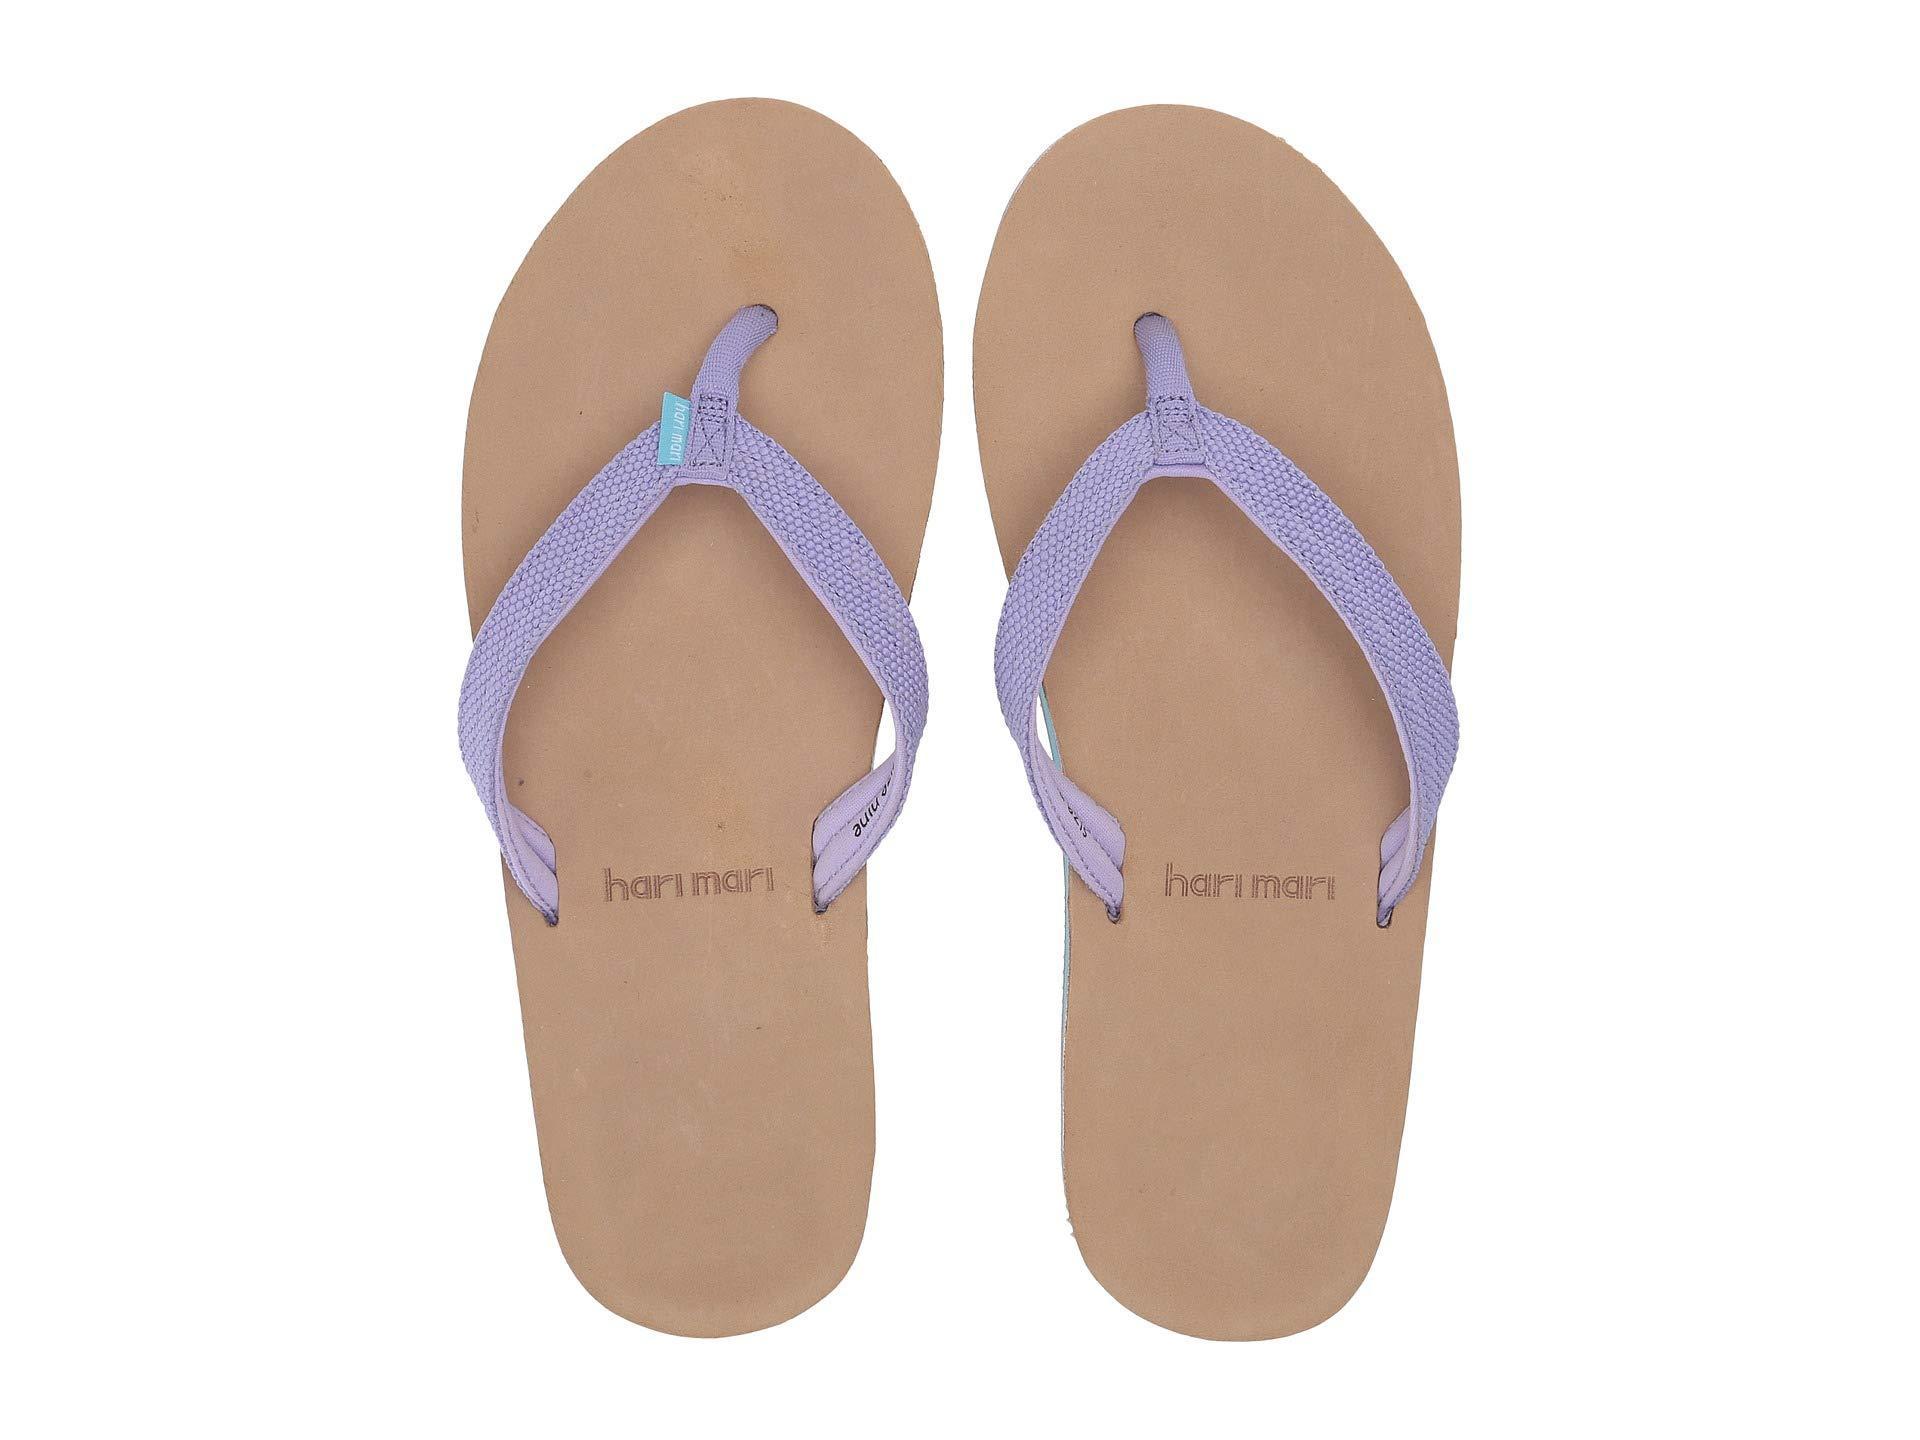 b7074c1831b0 Hari Mari - Multicolor Scouts (coral tan) Women s Sandals - Lyst. View  fullscreen